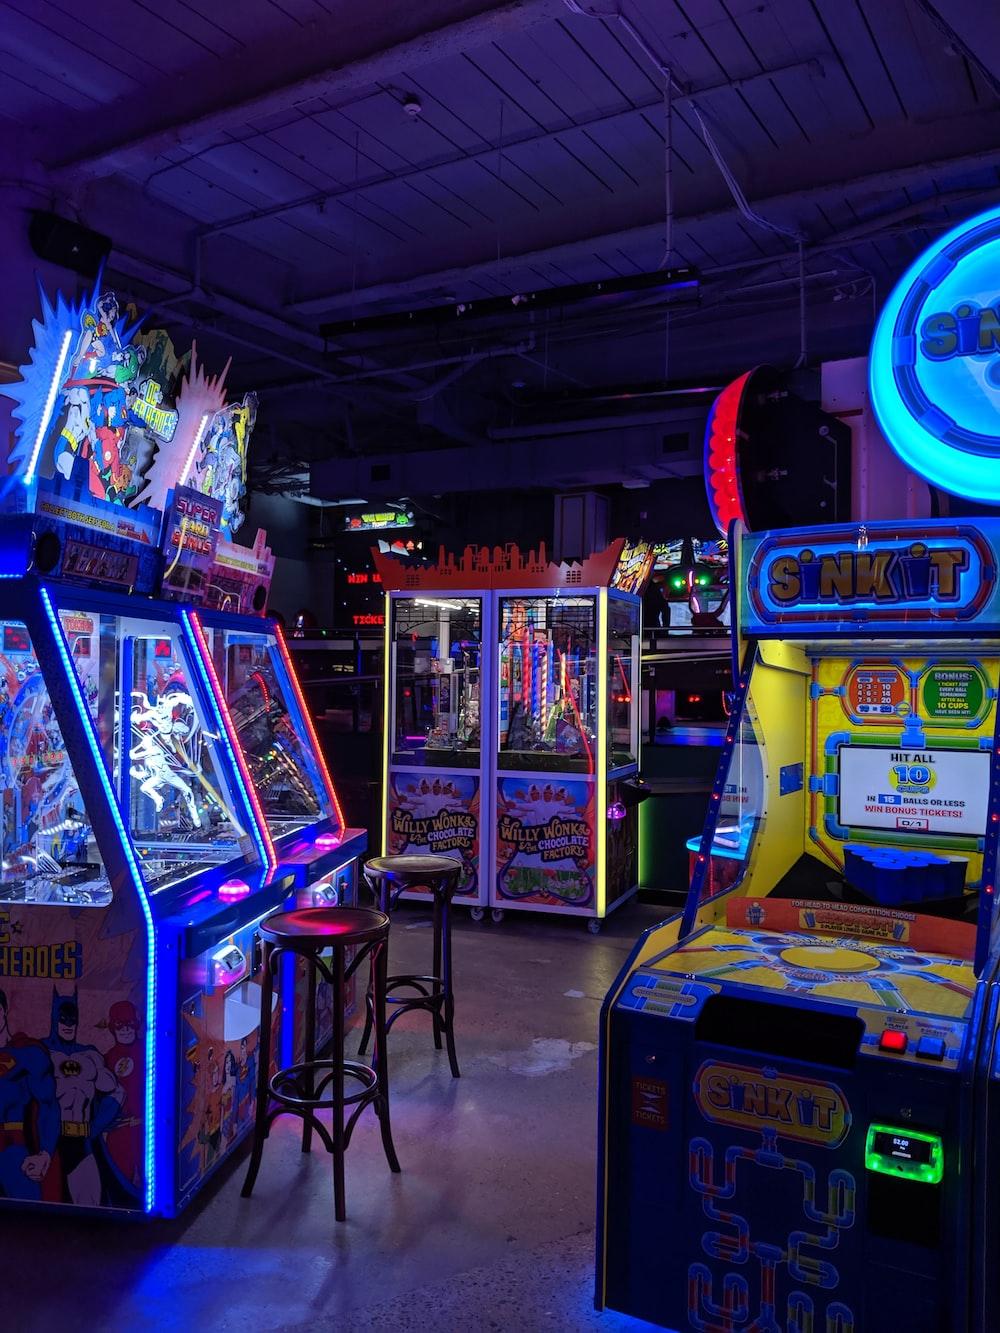 assorted-color arcade machines